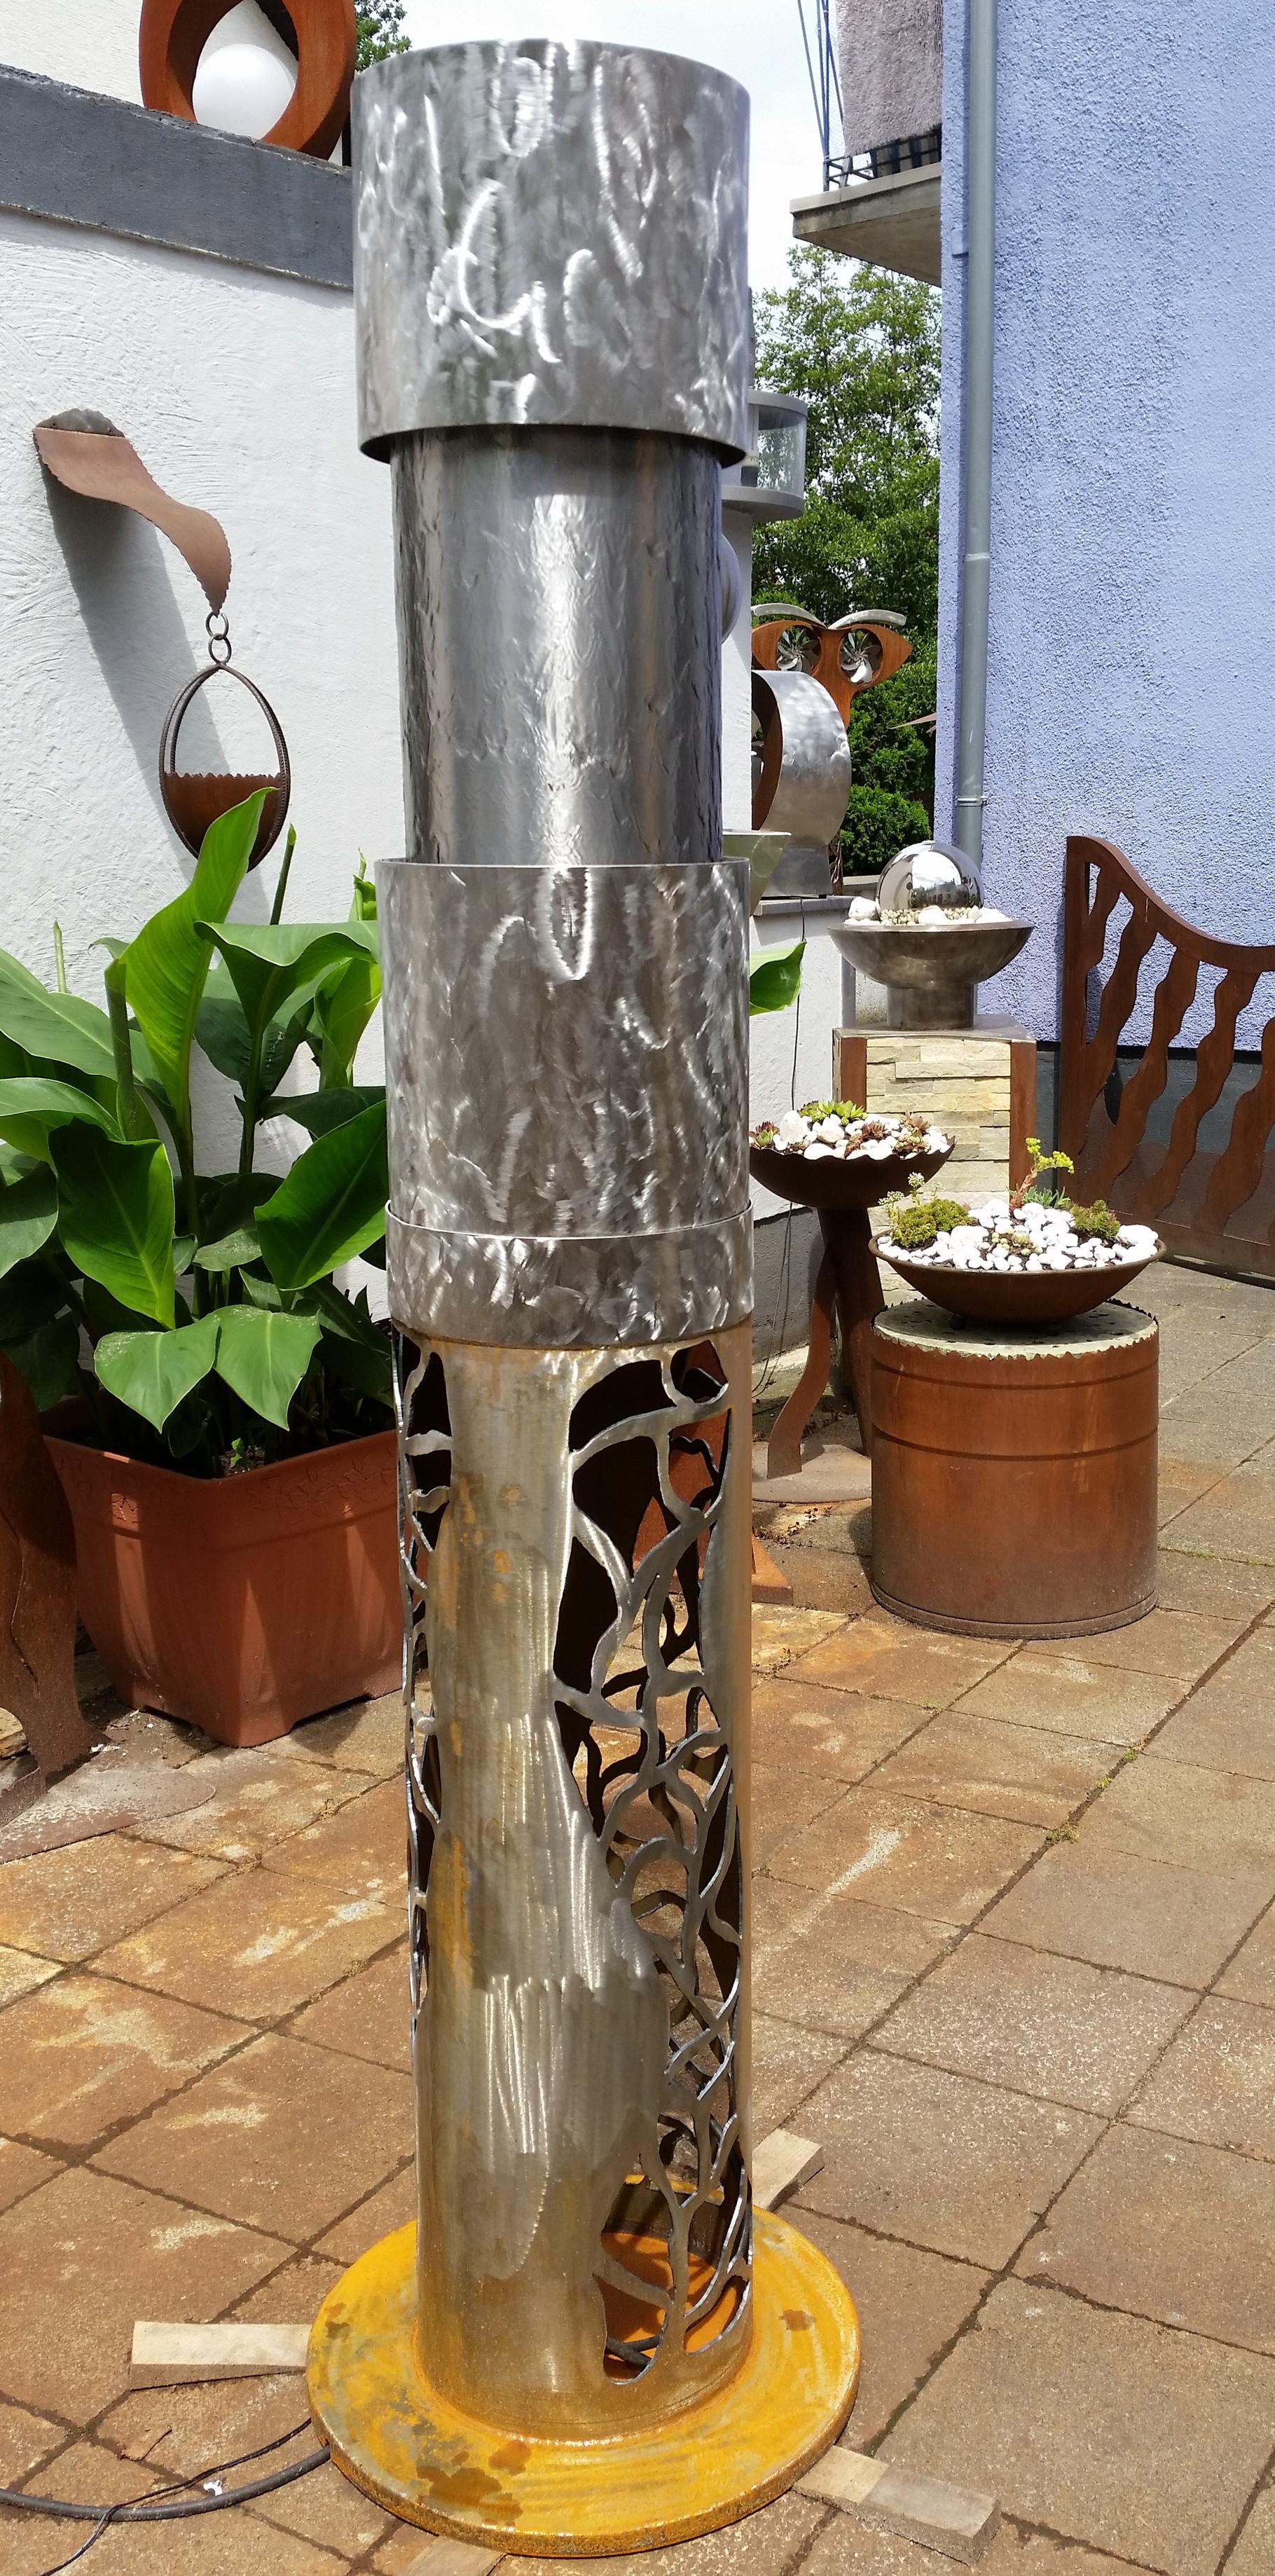 Einzigartig Gartendeko Edelstahl Ideen